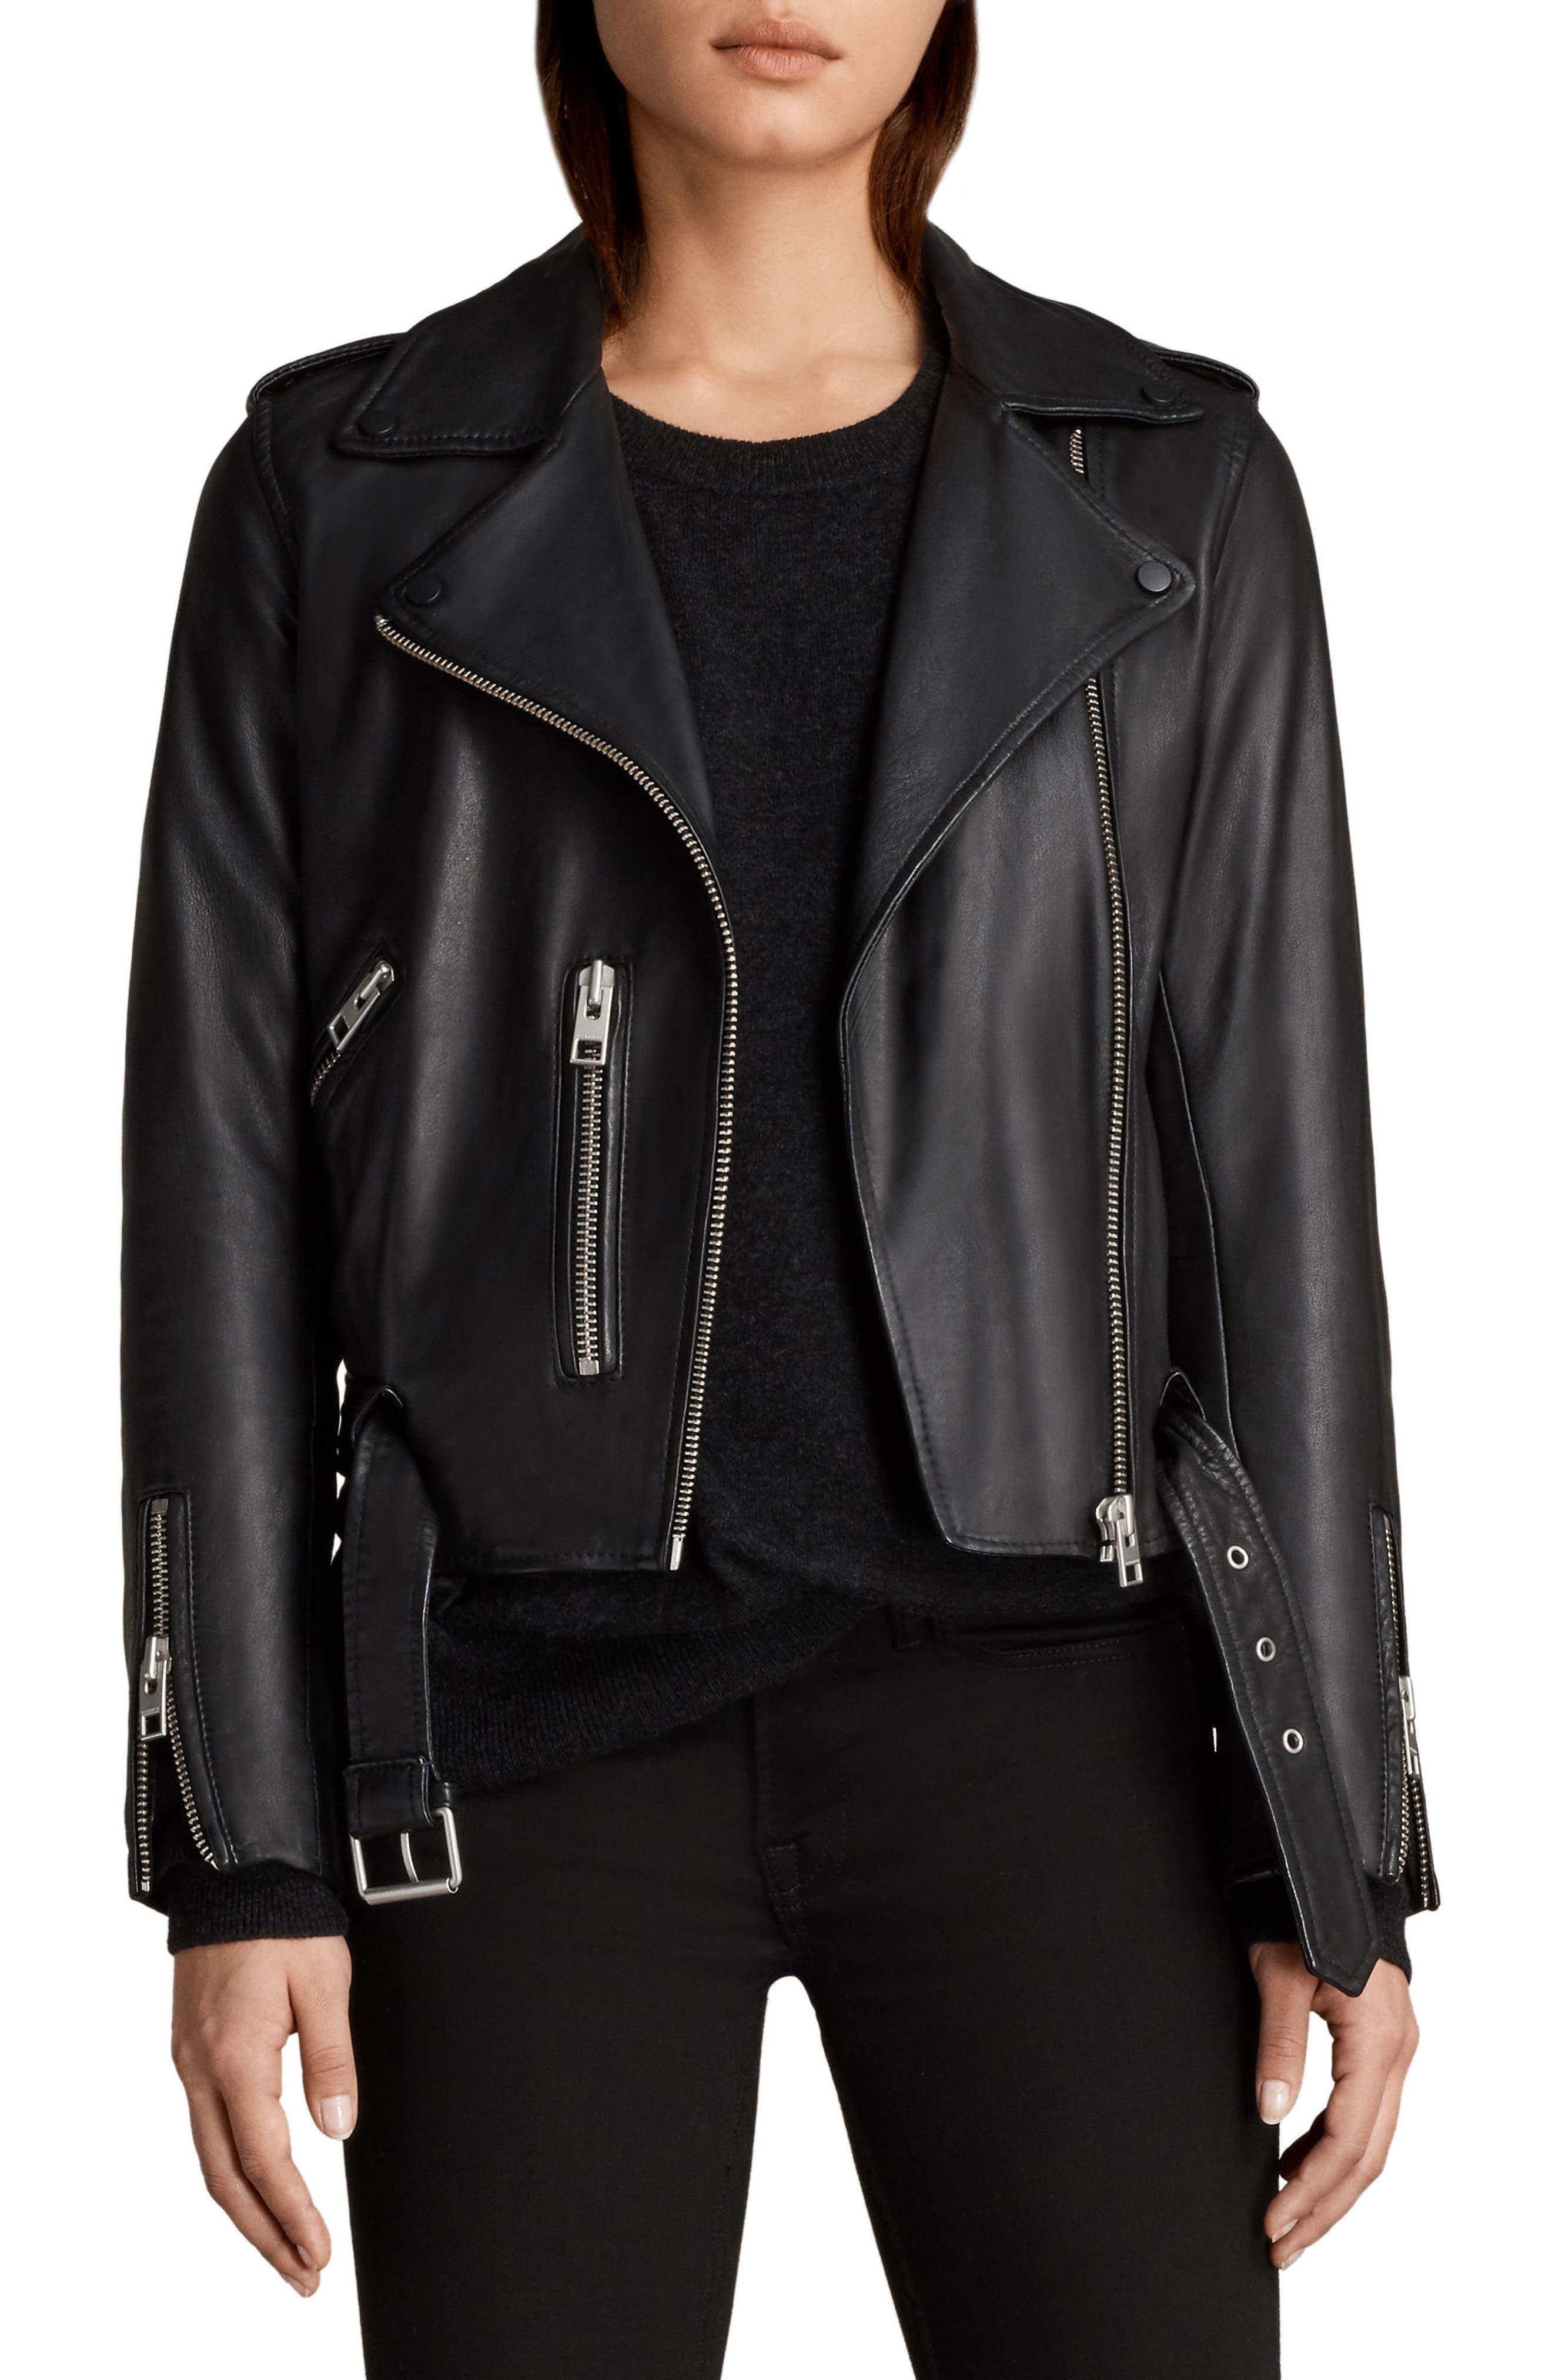 Balfern Leather Biker Jacket,                         Main,                         color, Black